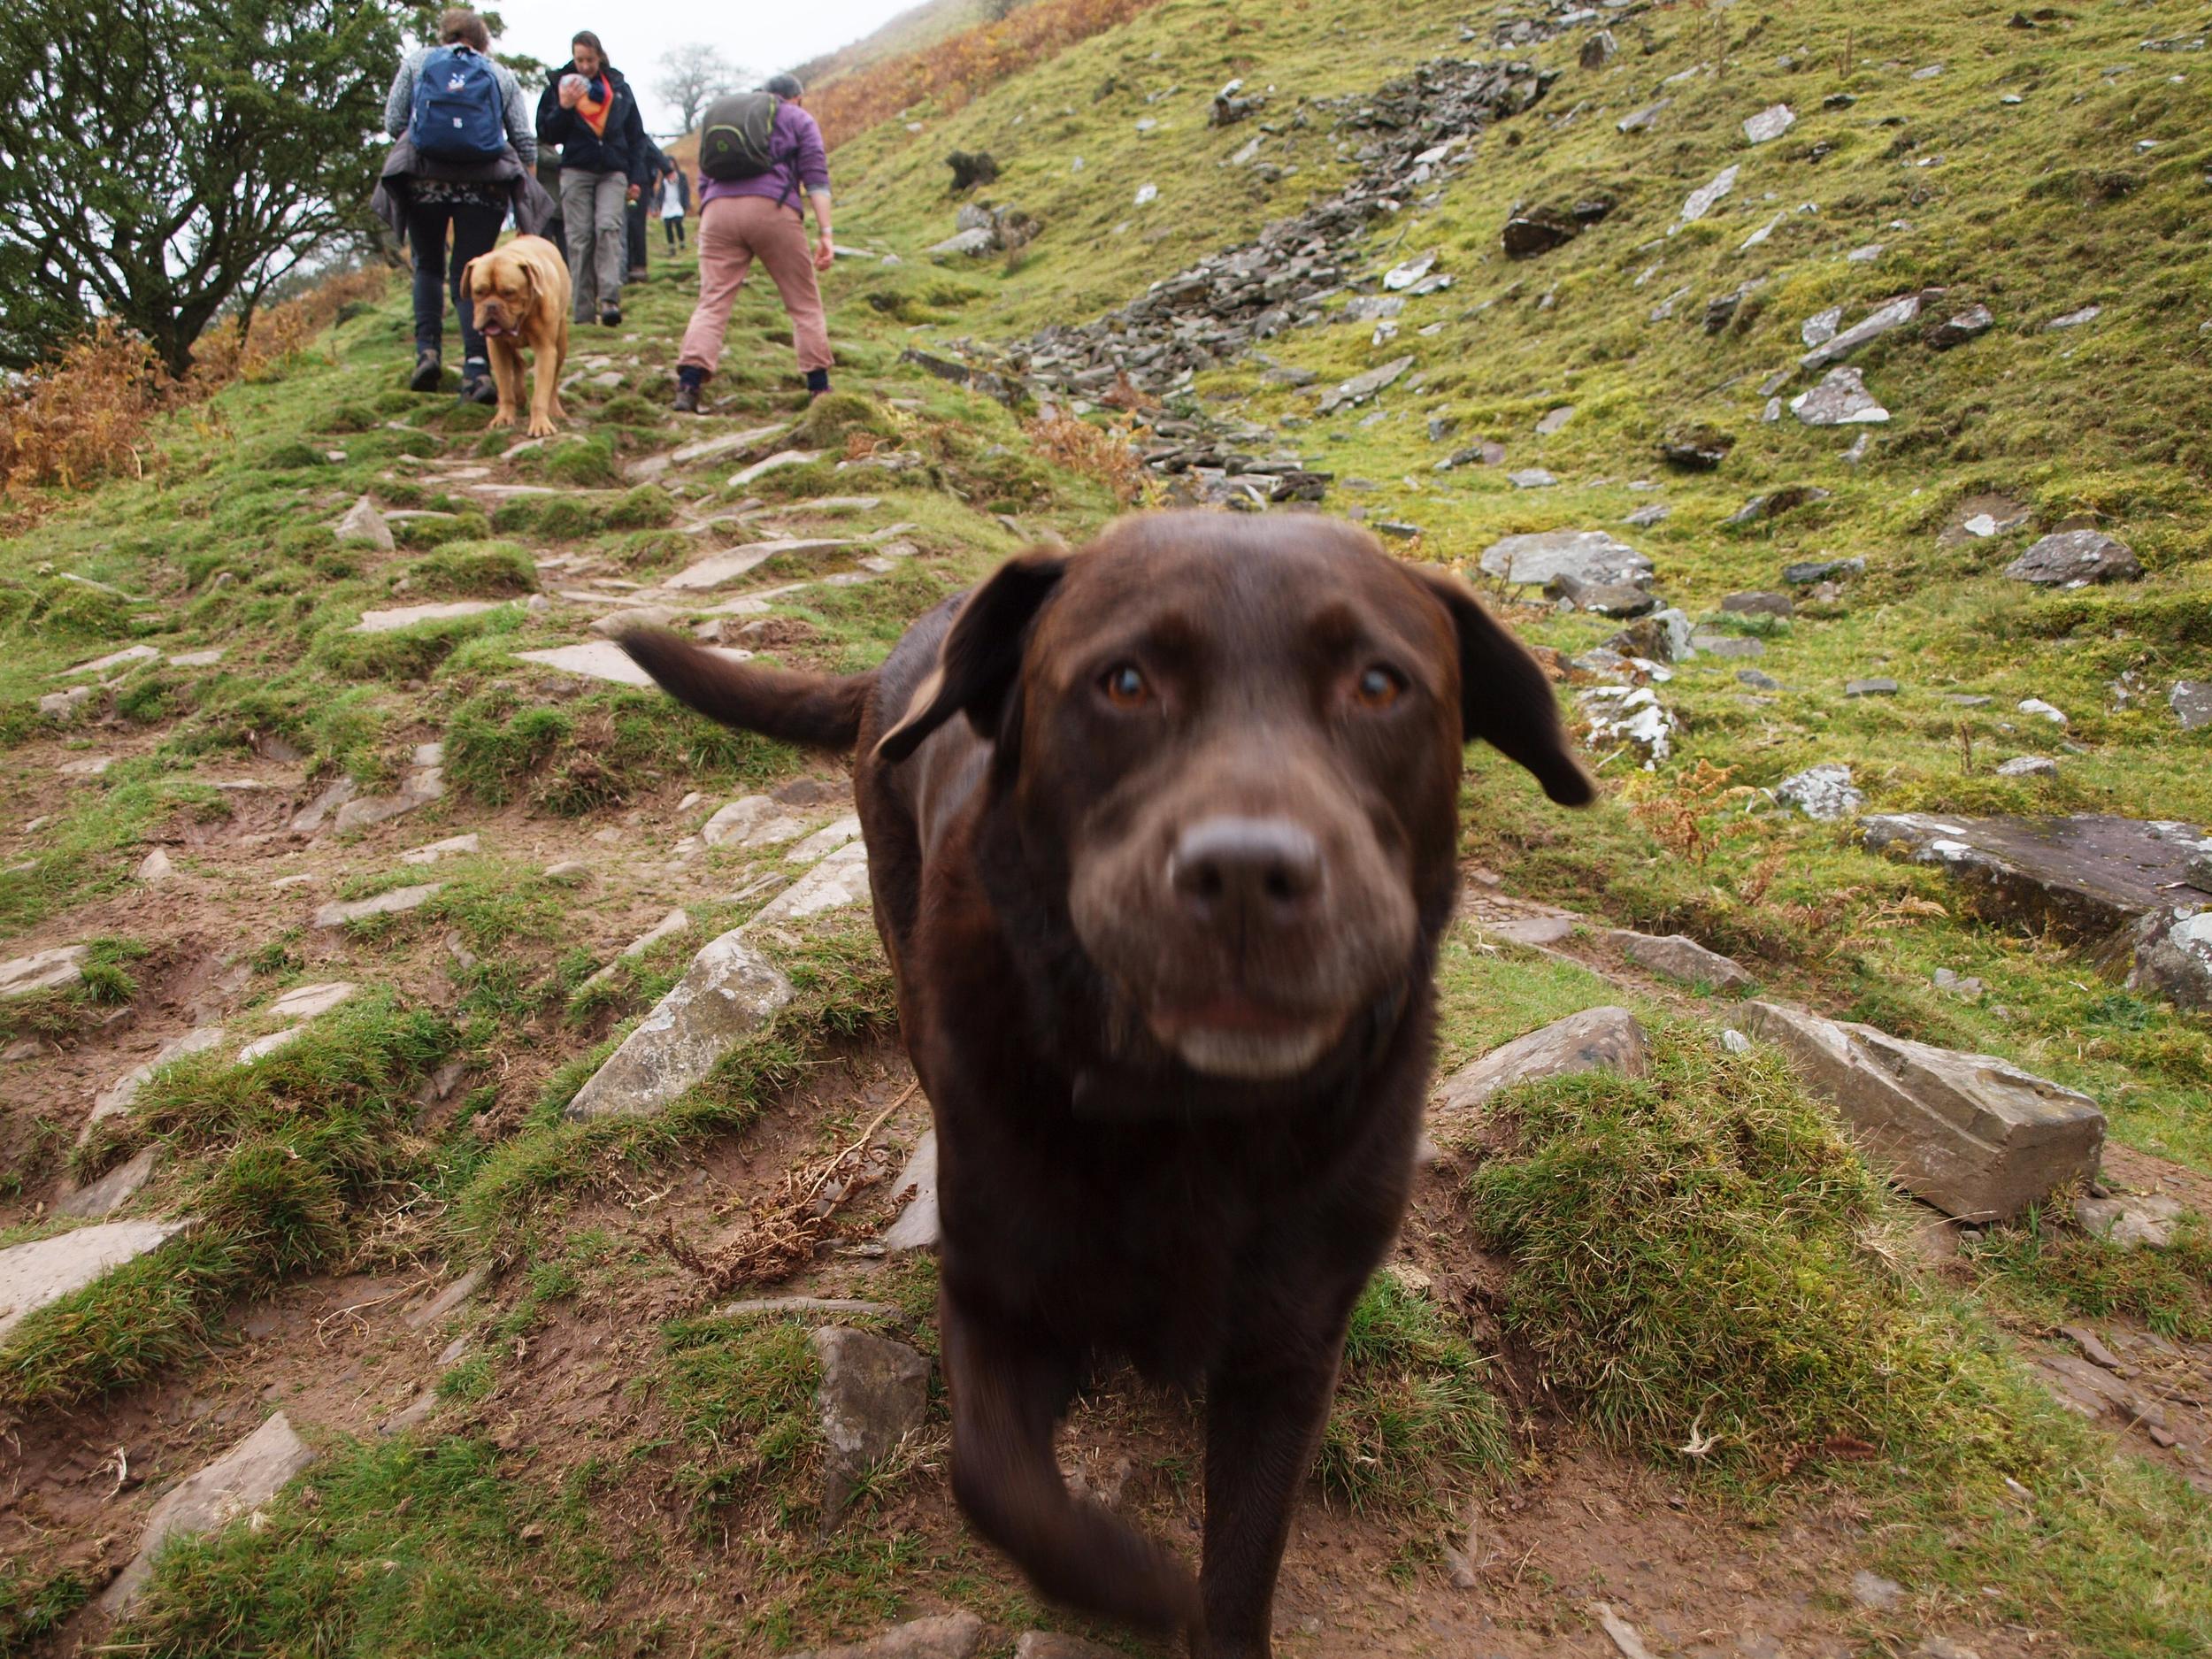 Dog rushing towards the camera